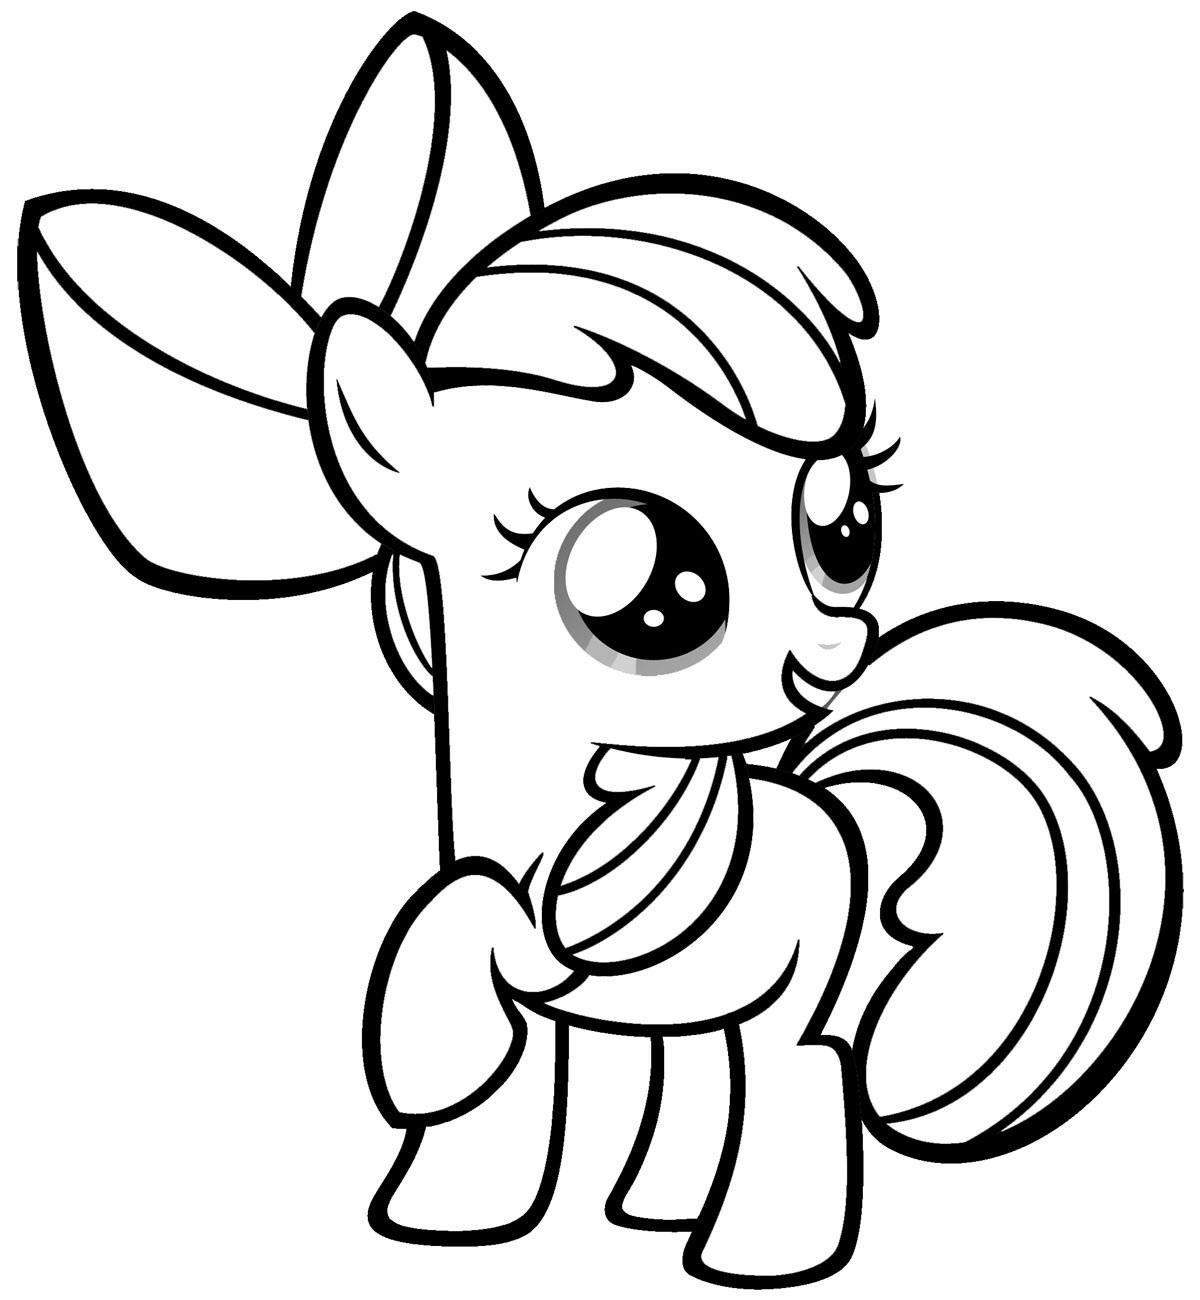 Pony coloring